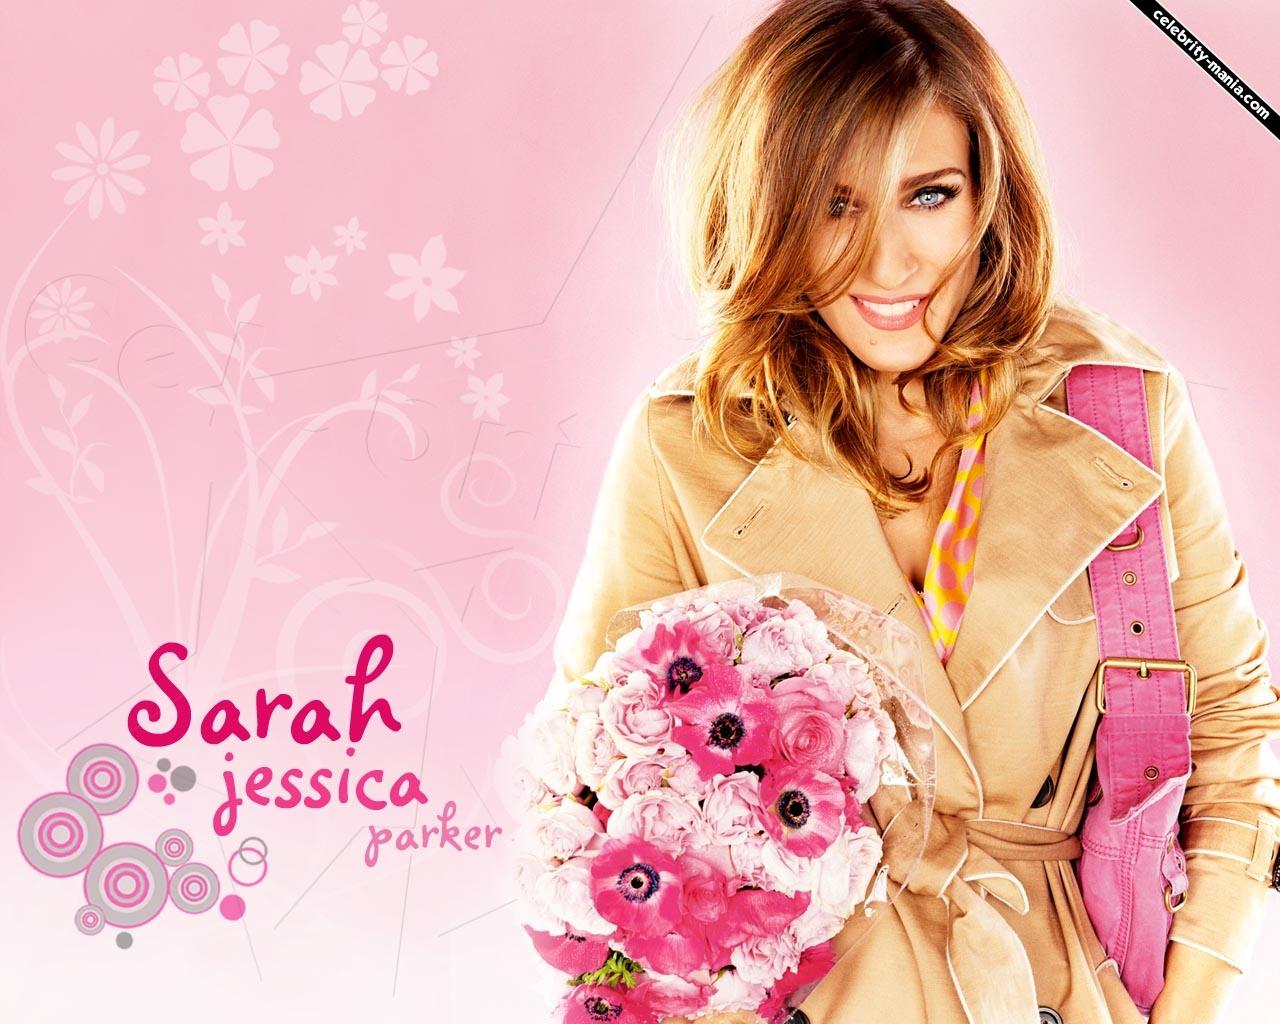 http://4.bp.blogspot.com/-RqoRSWof844/T6BdAKNf6fI/AAAAAAAACao/fdNX9es7Kew/s1600/Sarah+Jessica+Parker+wallpapers+1.jpg